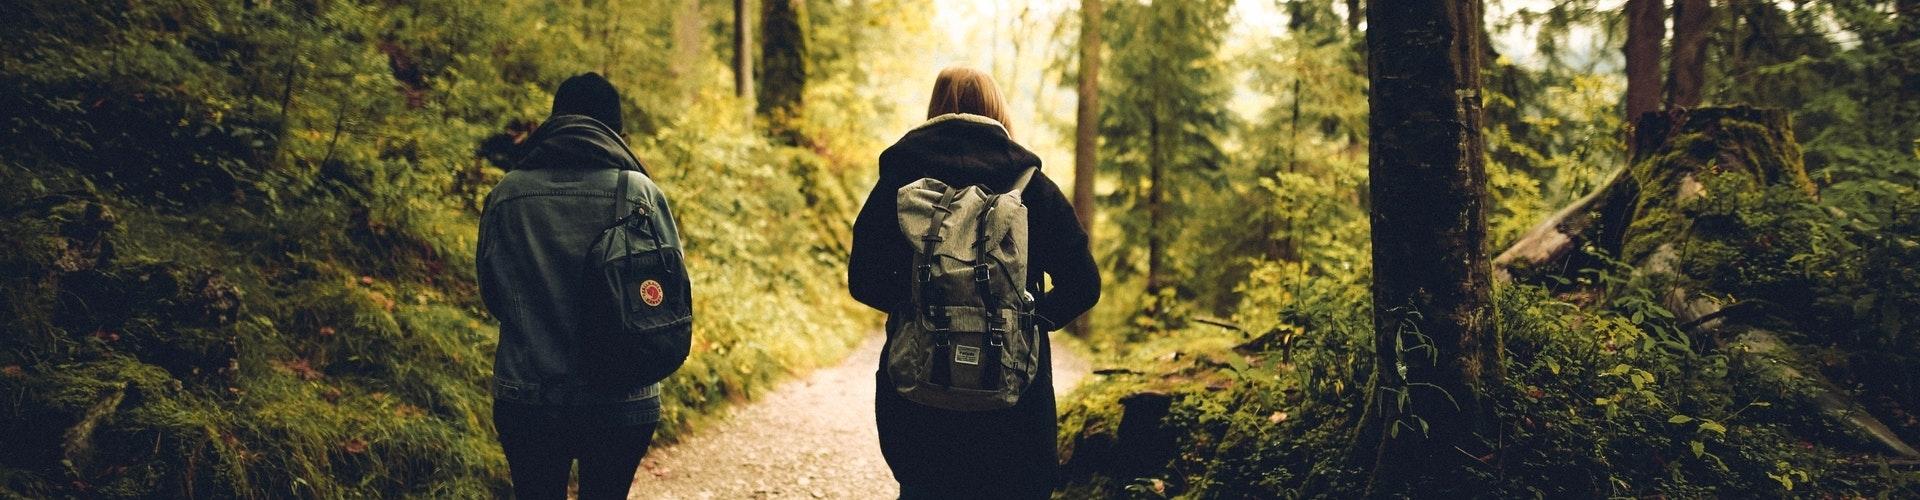 Happyholics coaching wandelend in het bos